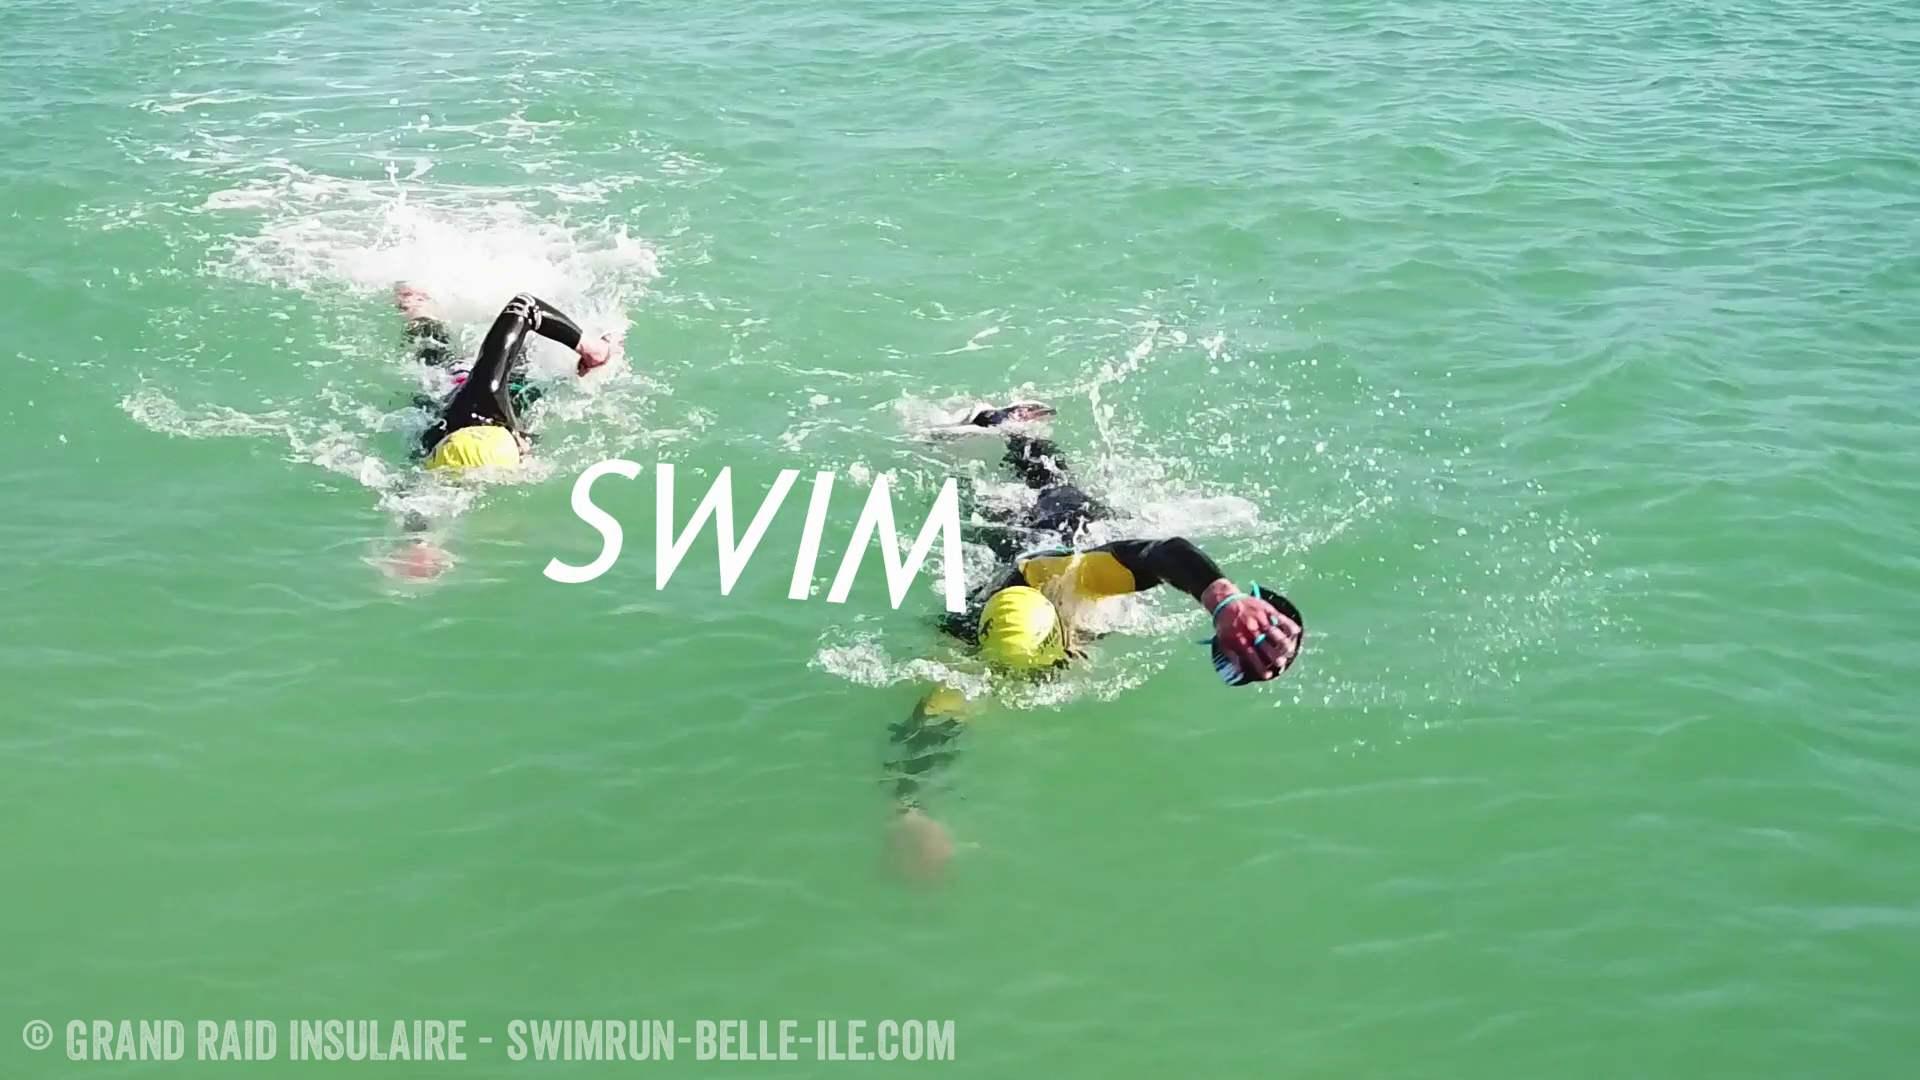 swimrun-hd_teaser_cr_resize_27